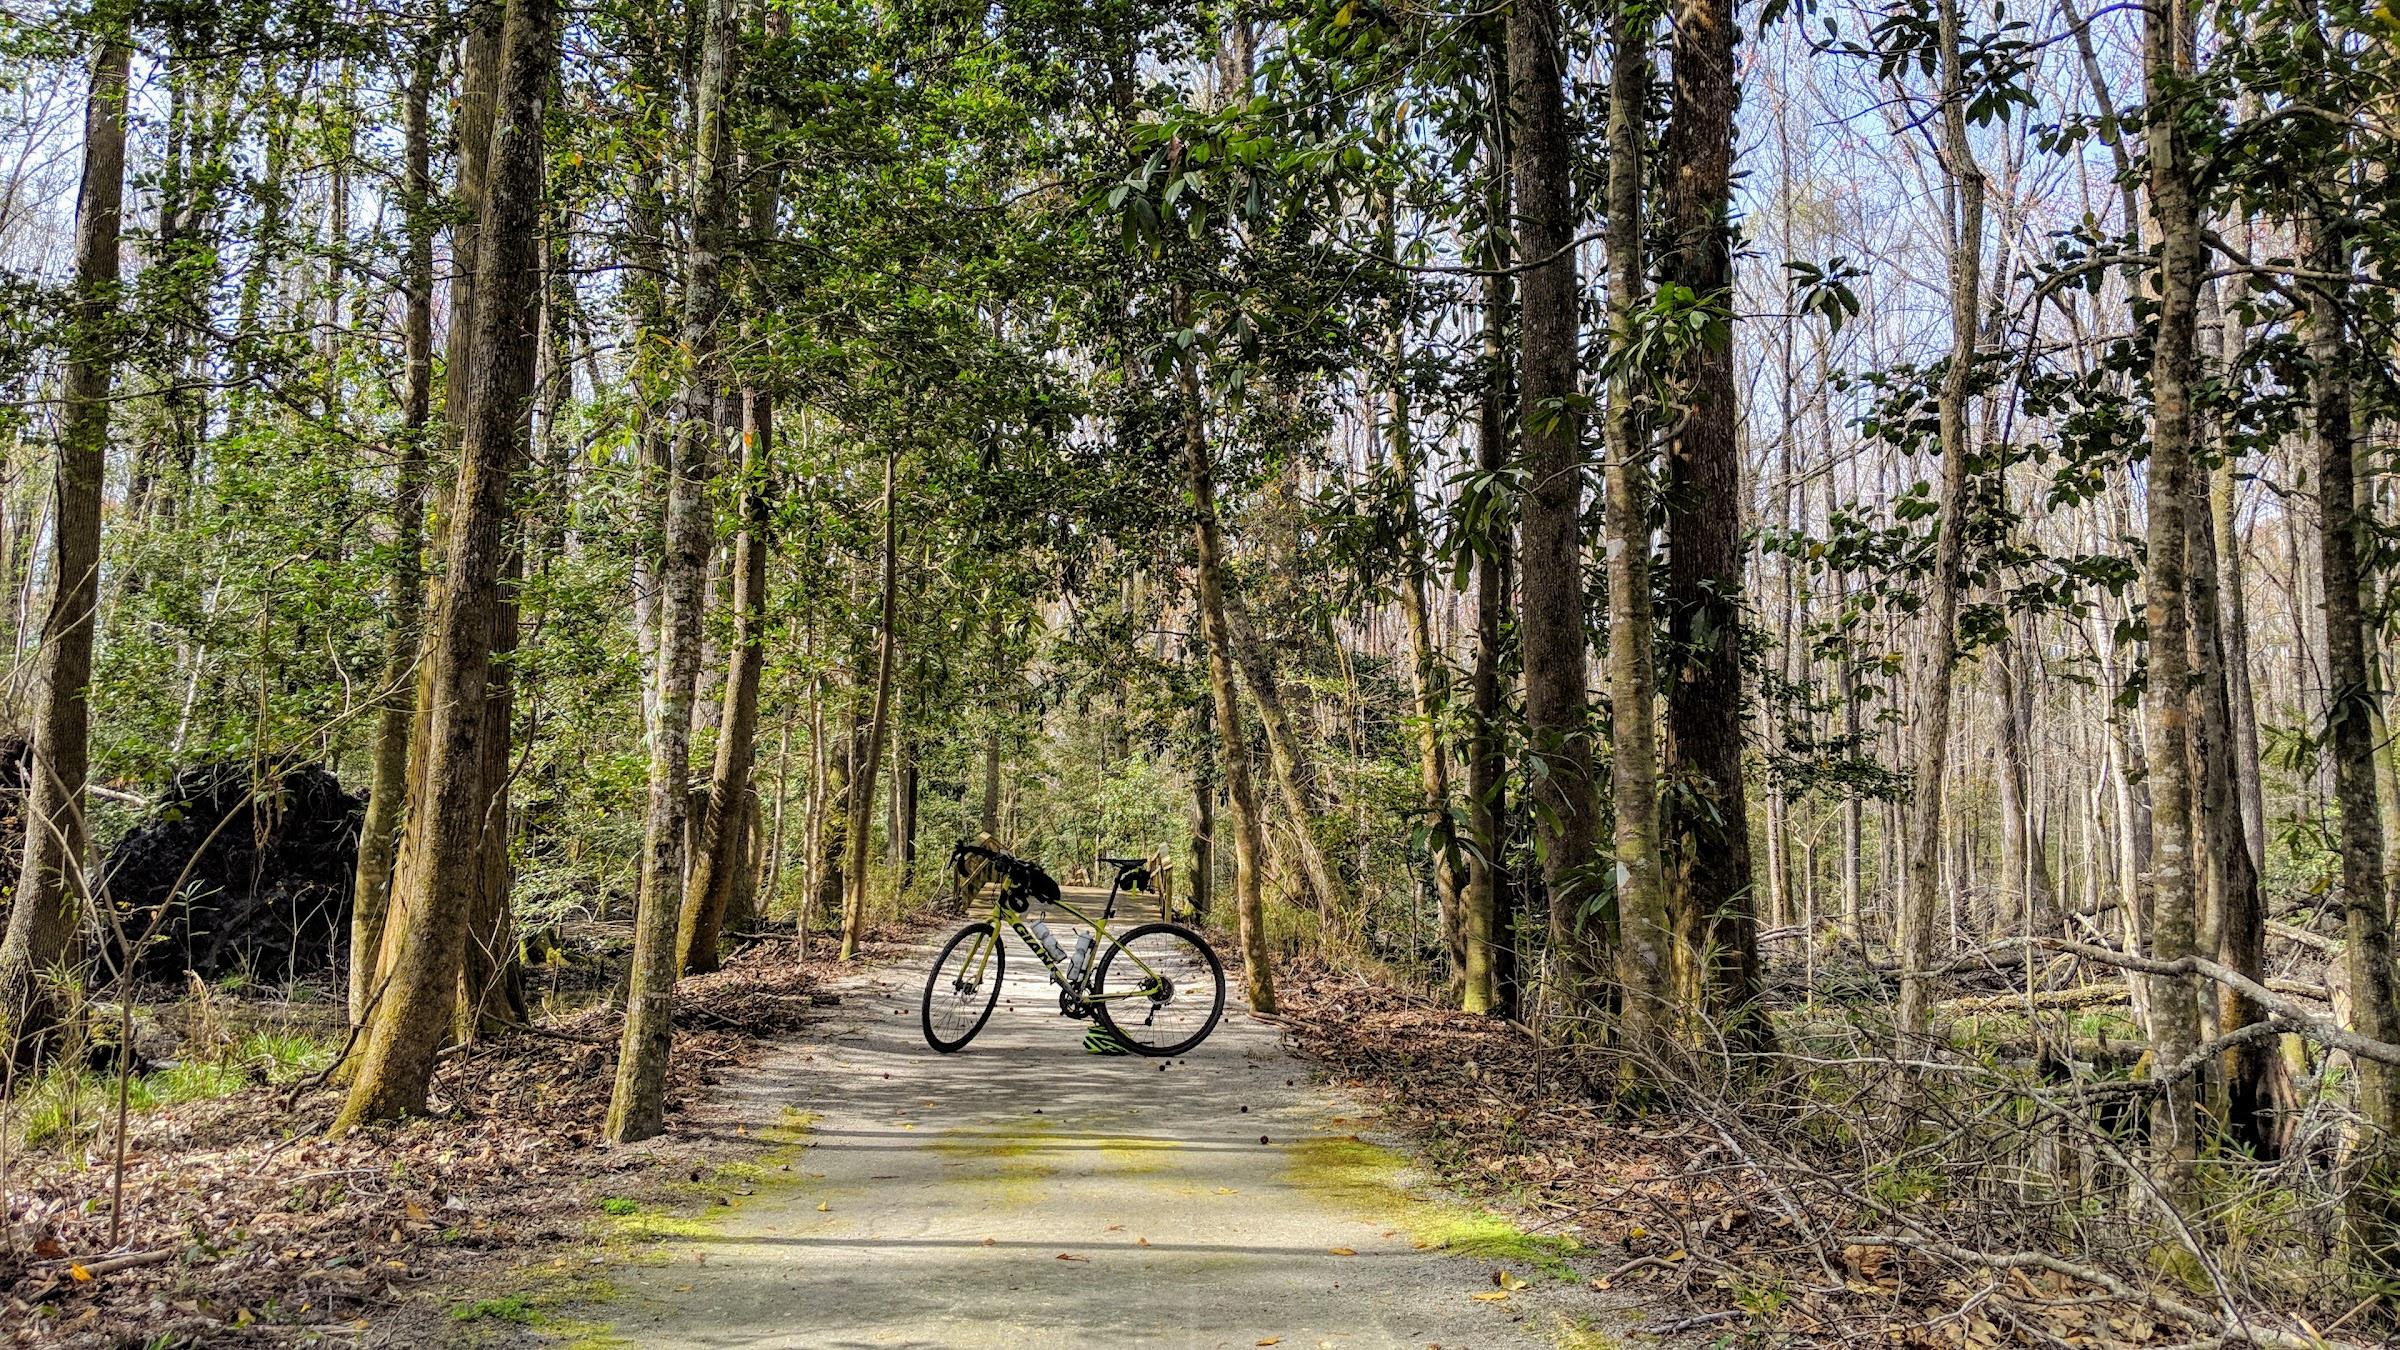 Bike on trail in Walterboro Wildlife Sanctuary